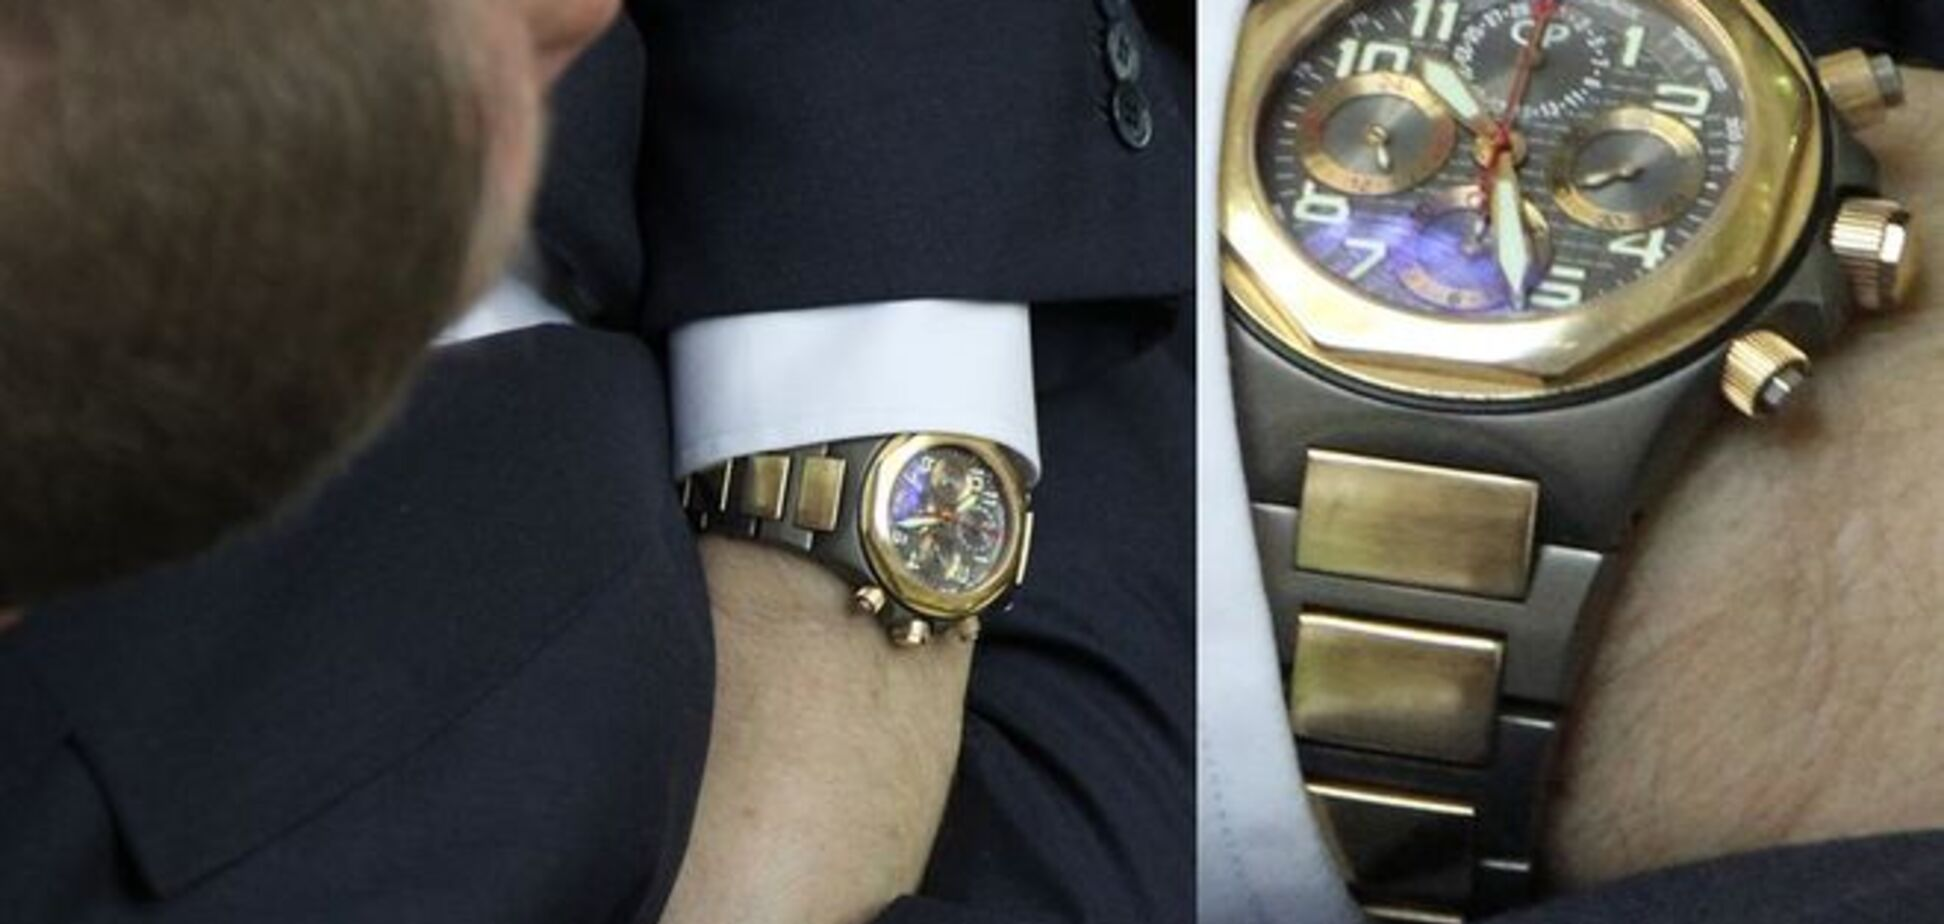 Нардепа Денисенка засікли з годинником за 240 тис. гривень: фотофакт